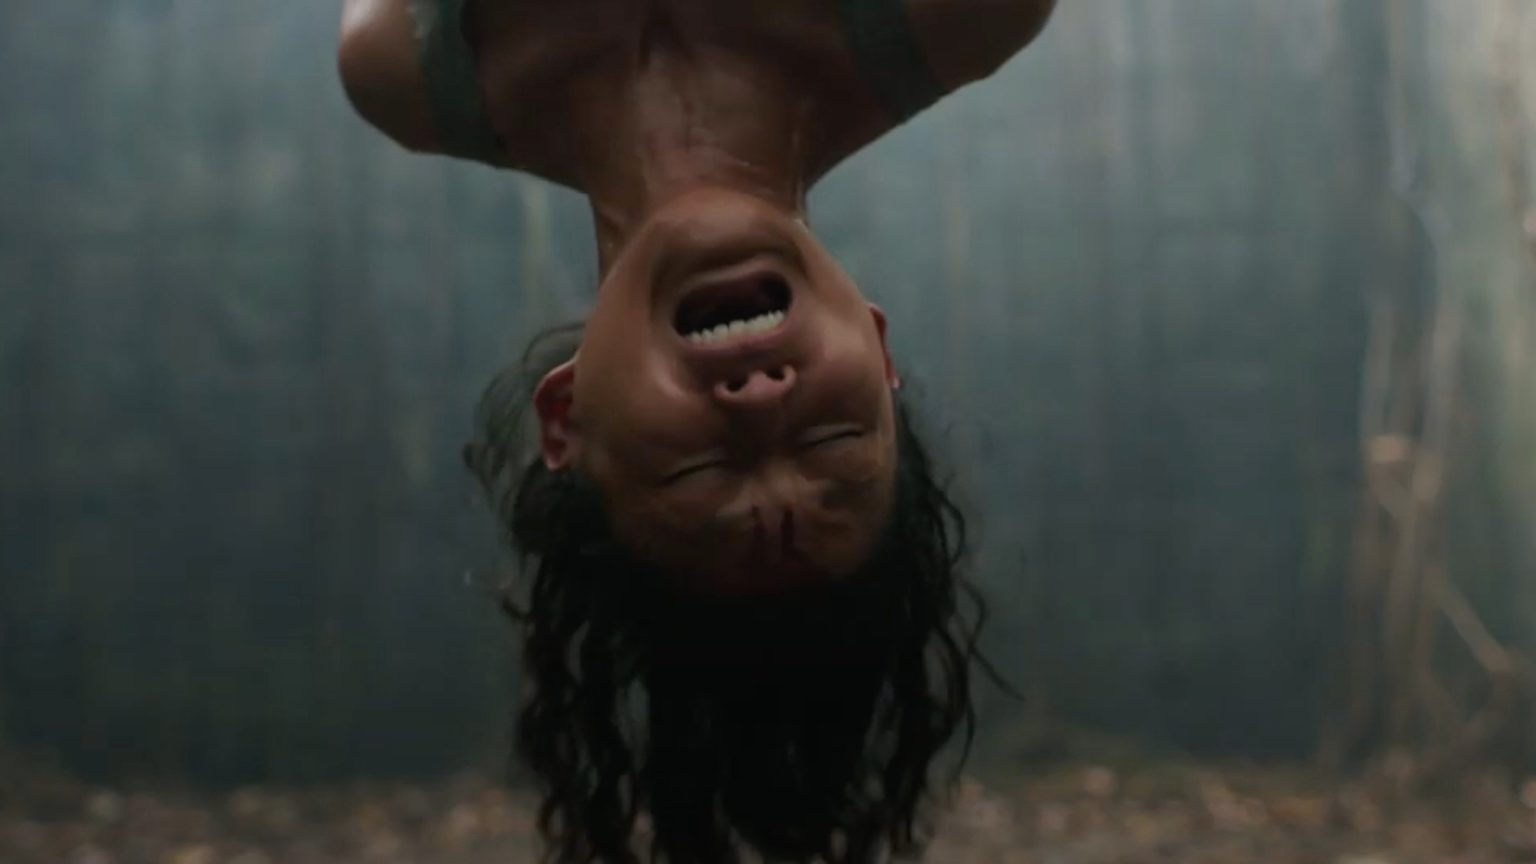 Female hanging upside down. Impetigore